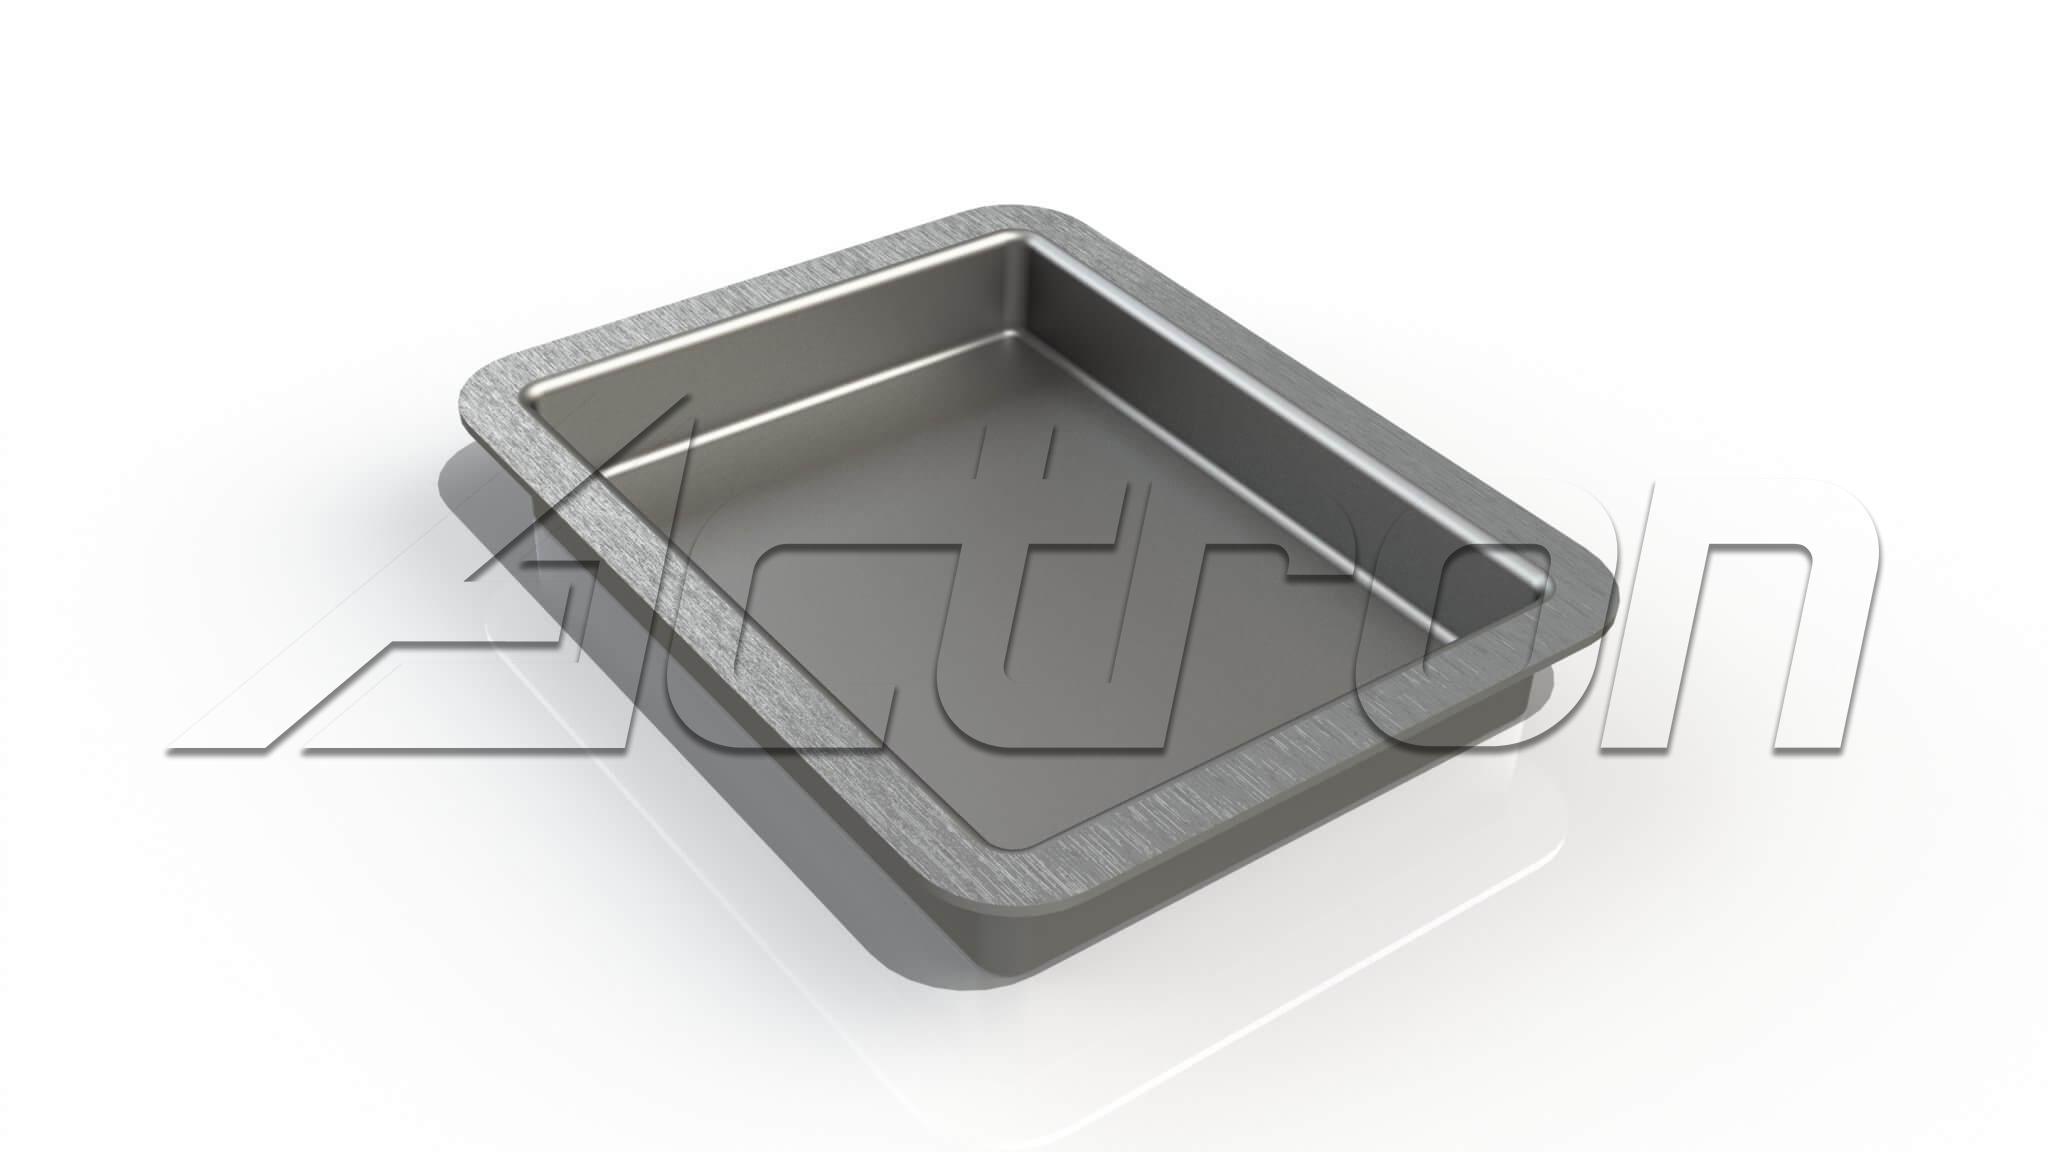 cup-pull-5298-a45017.jpg